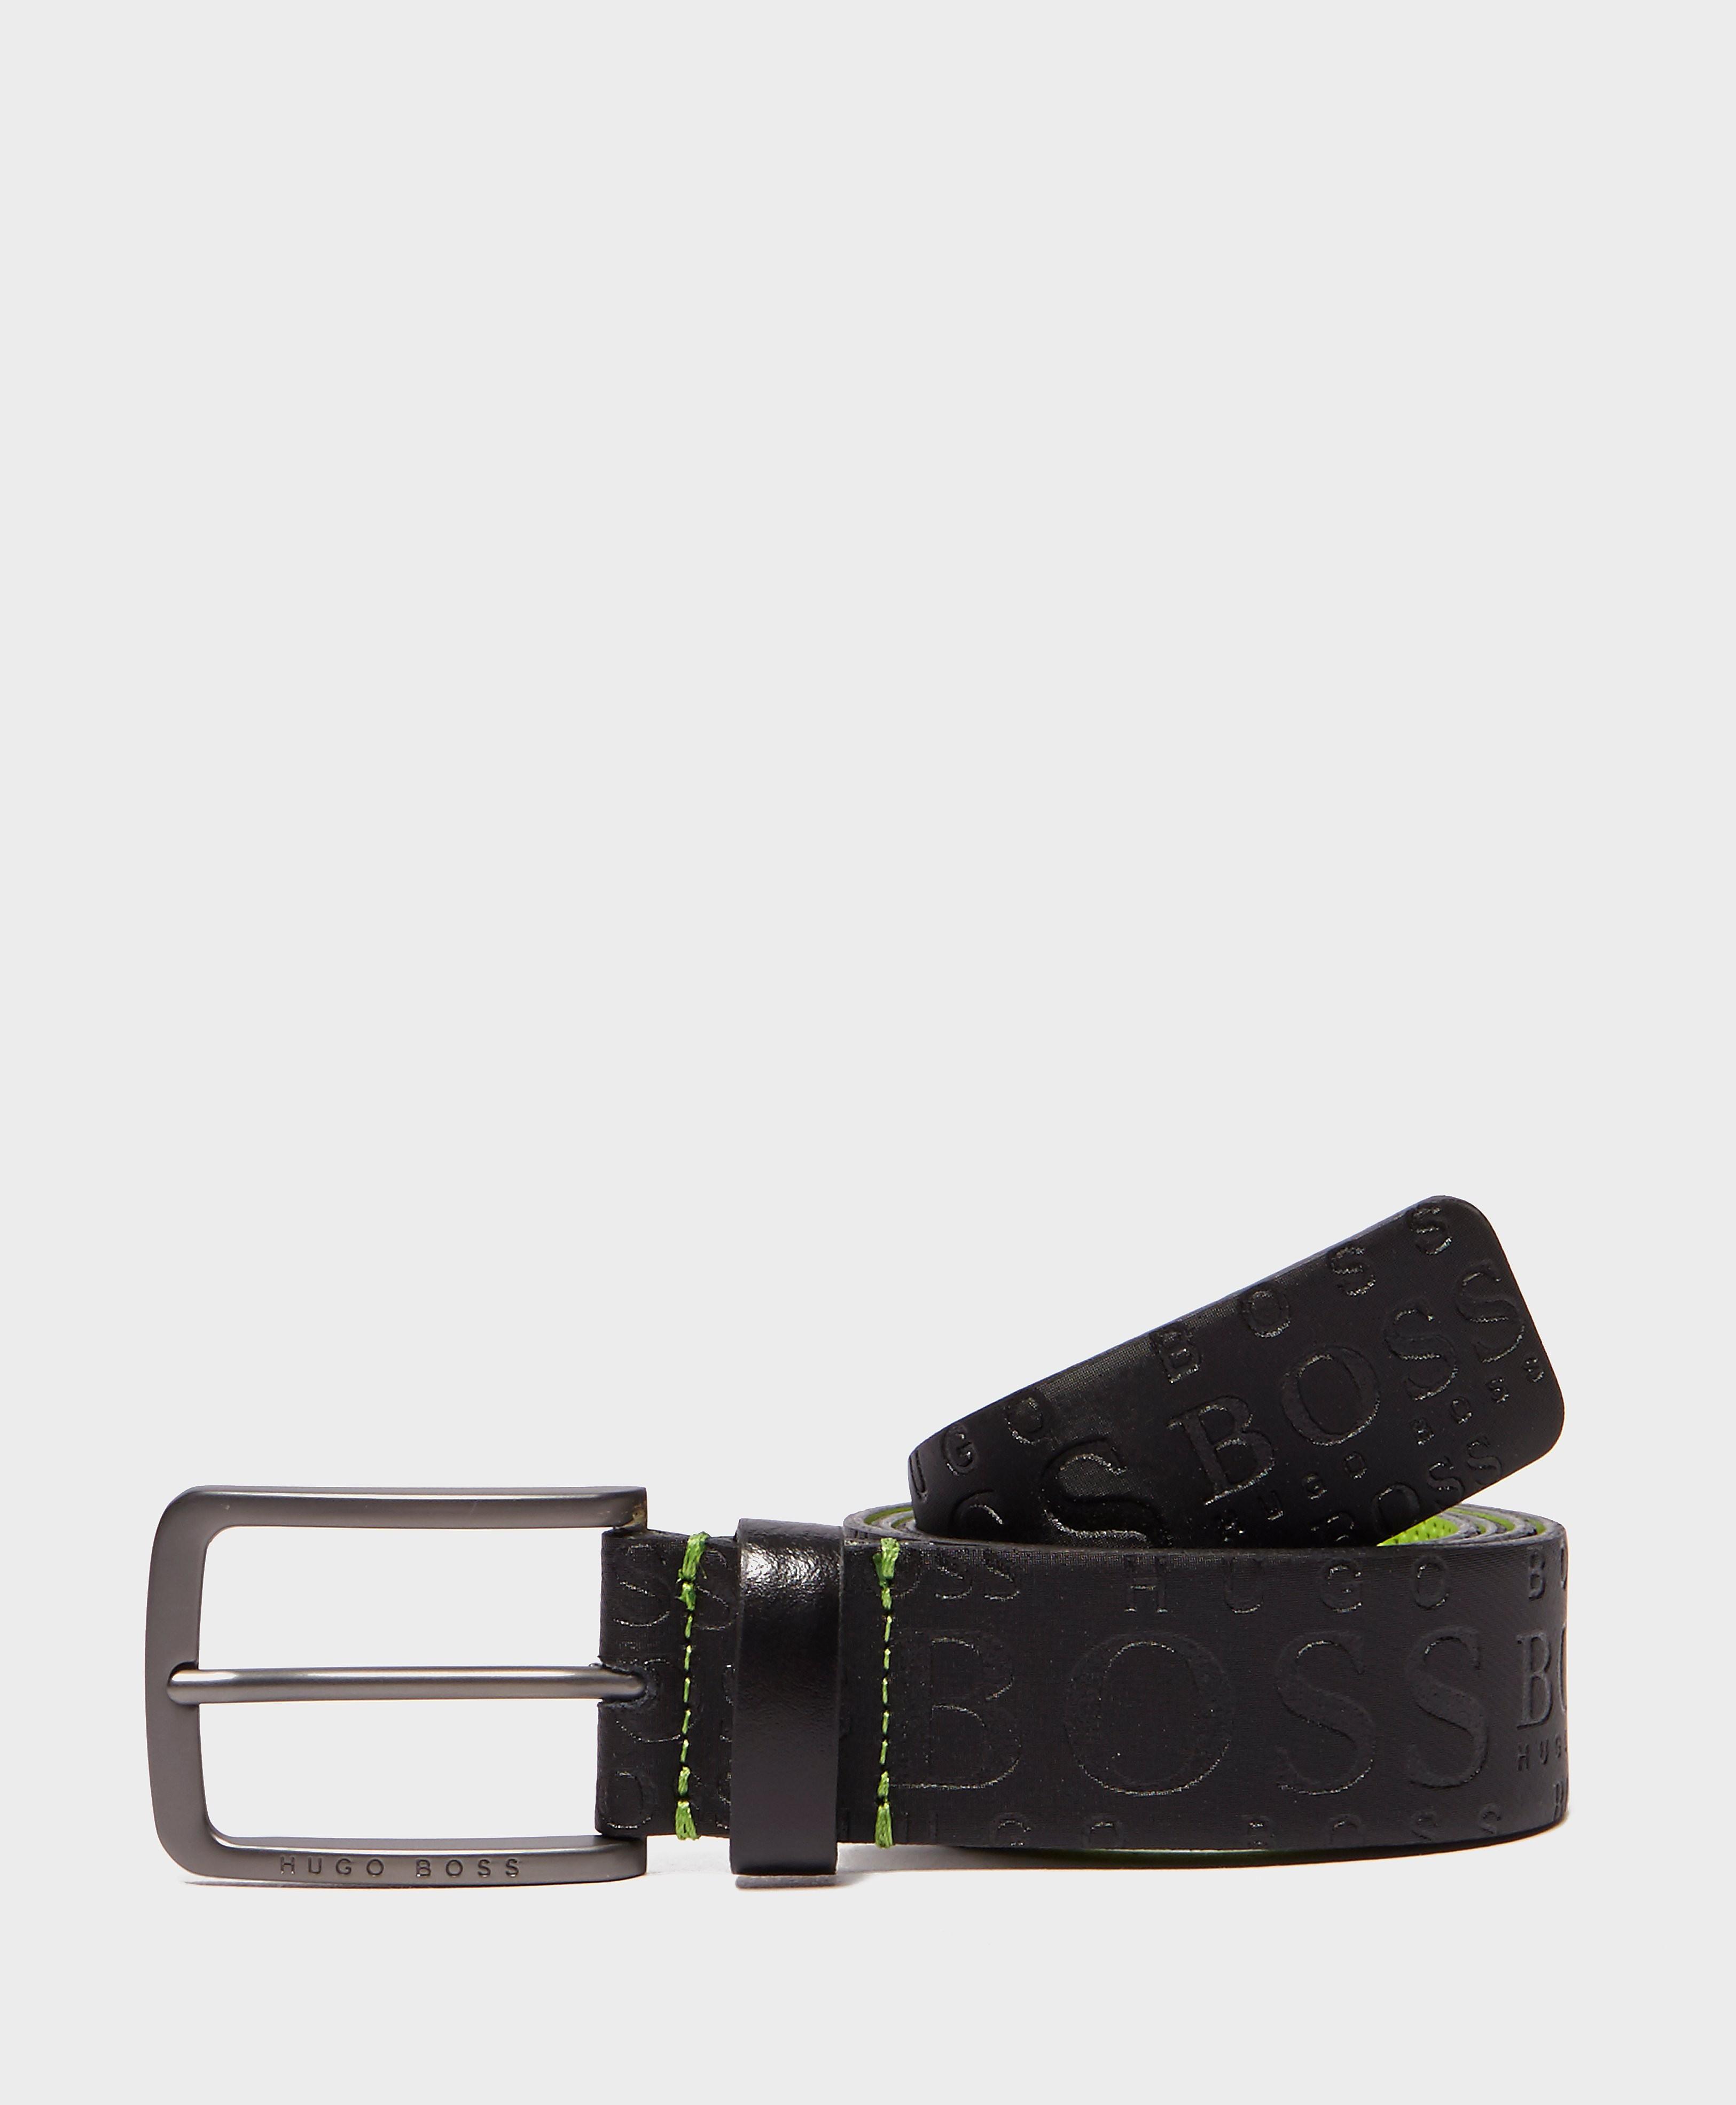 BOSS Green Embossed Leather Belt